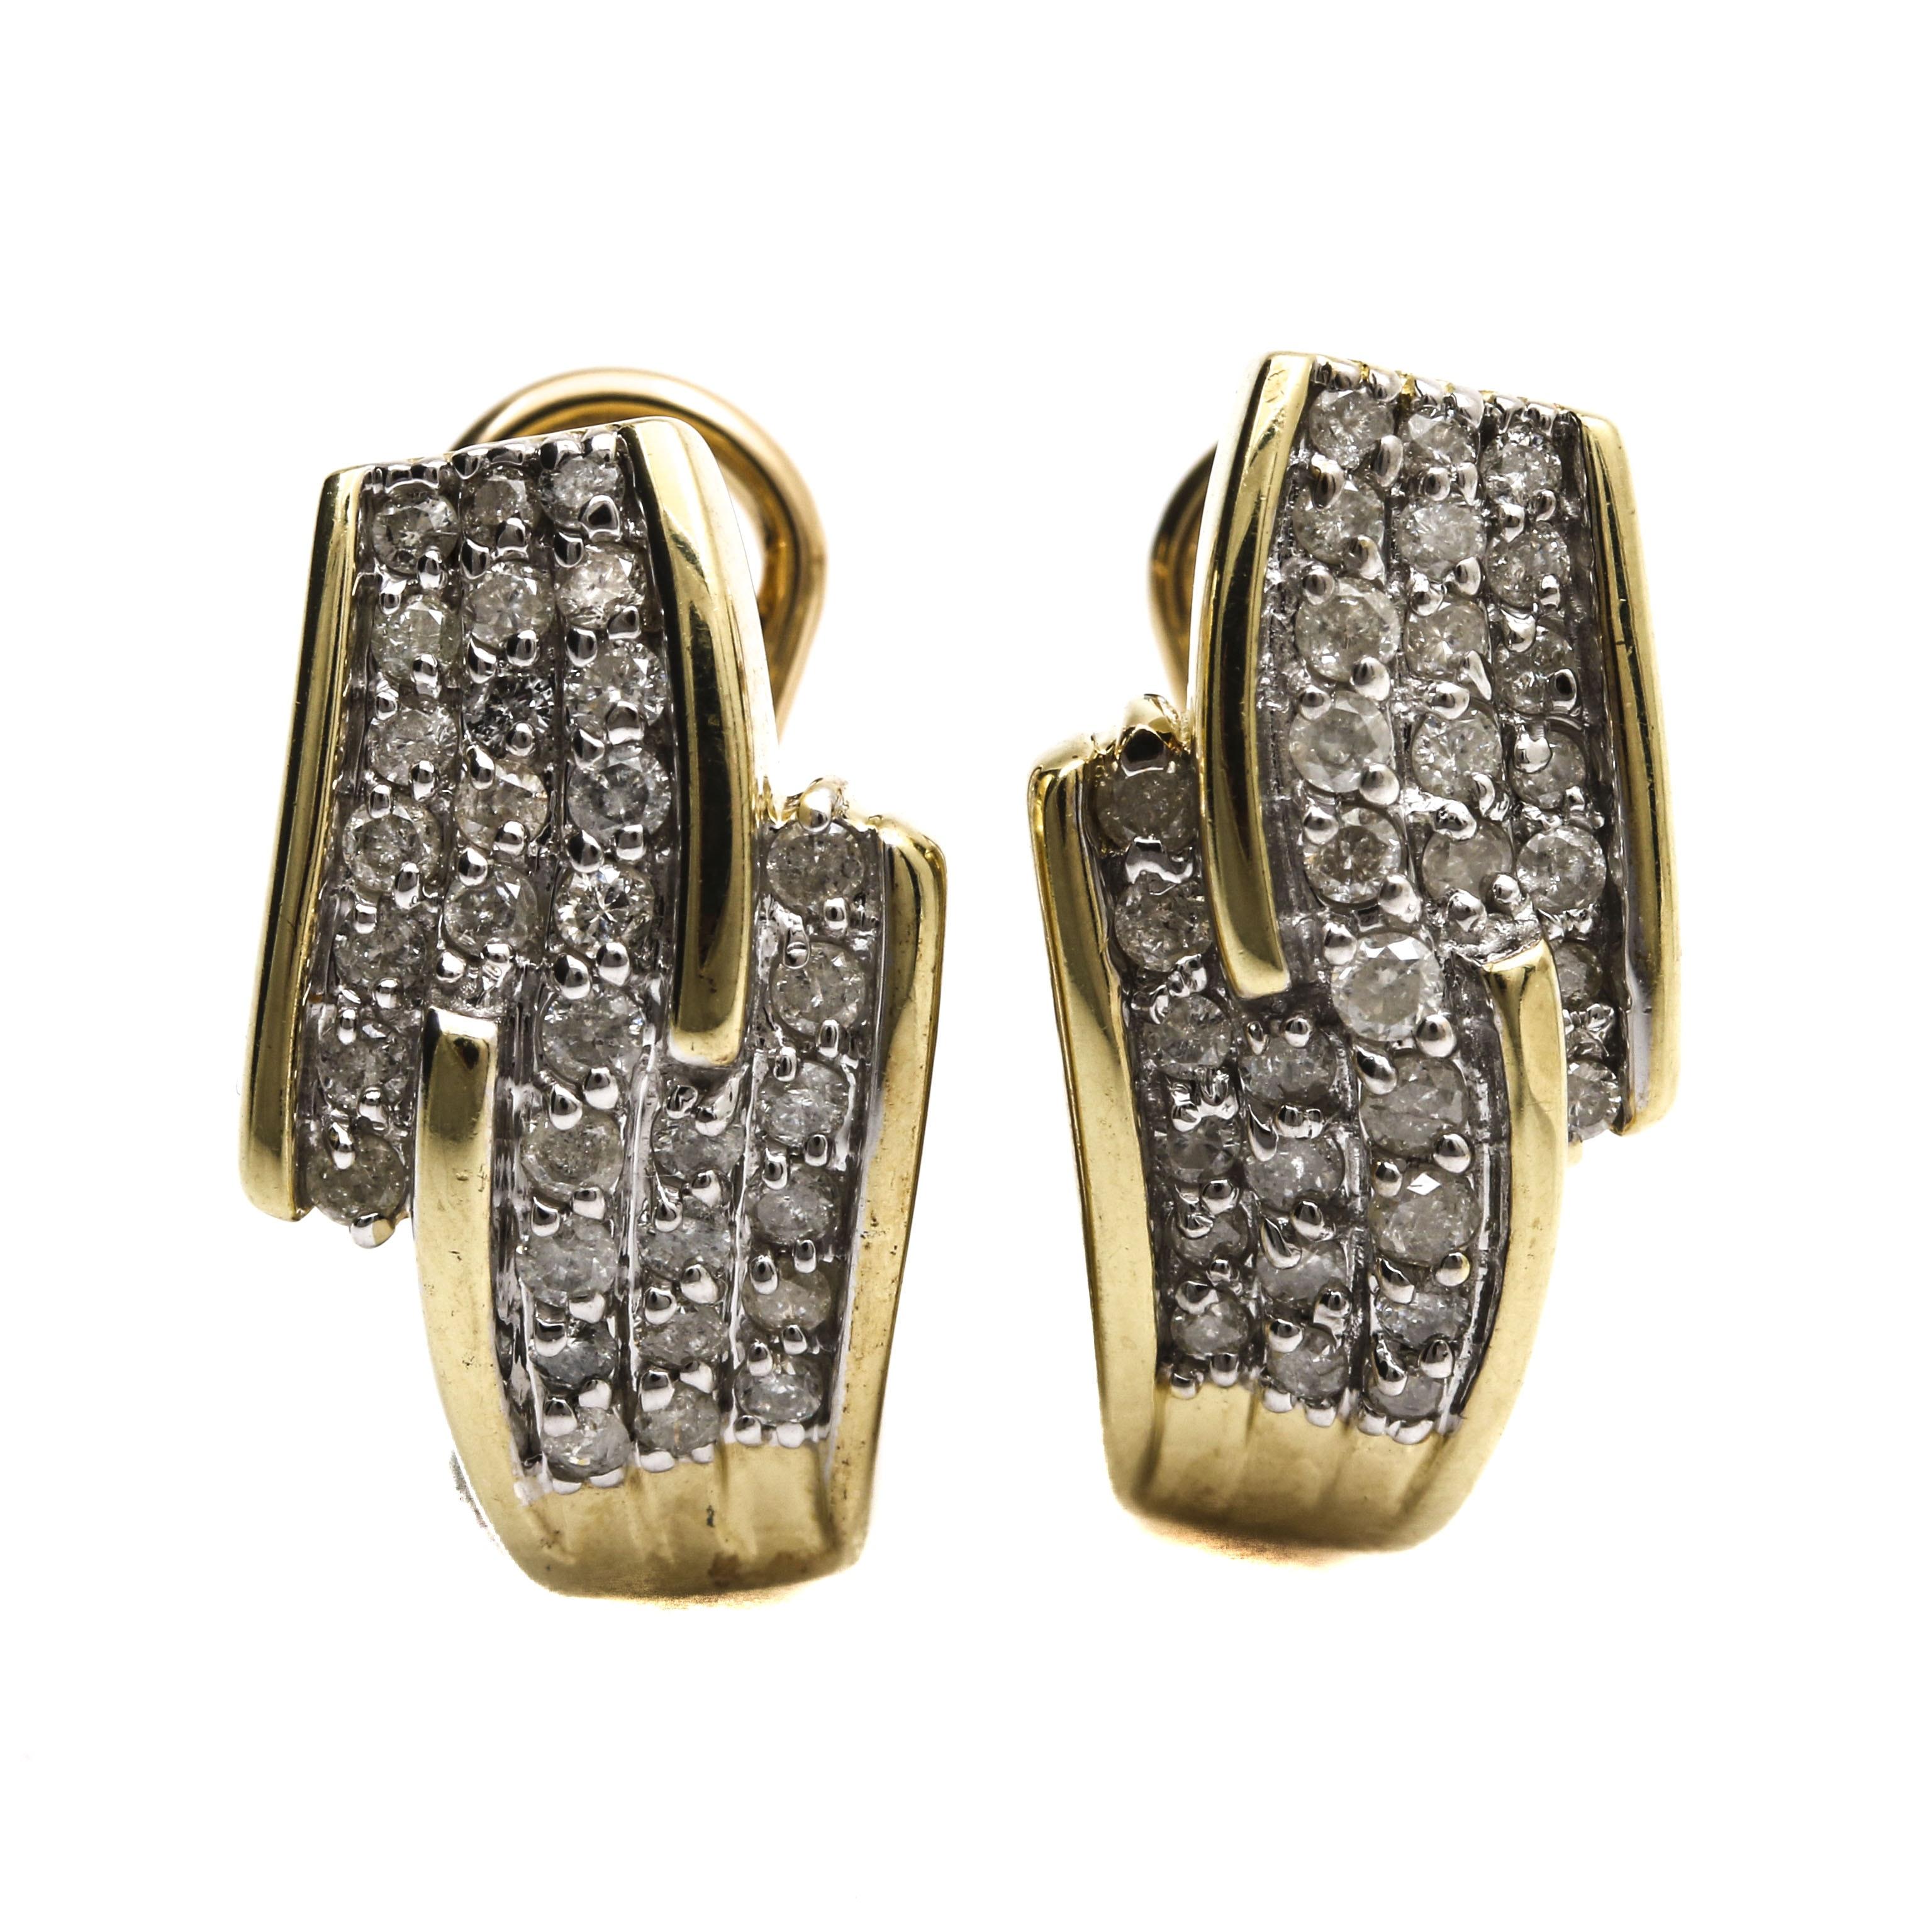 10K Yellow Gold 1.0 CTW Diamond Earrings